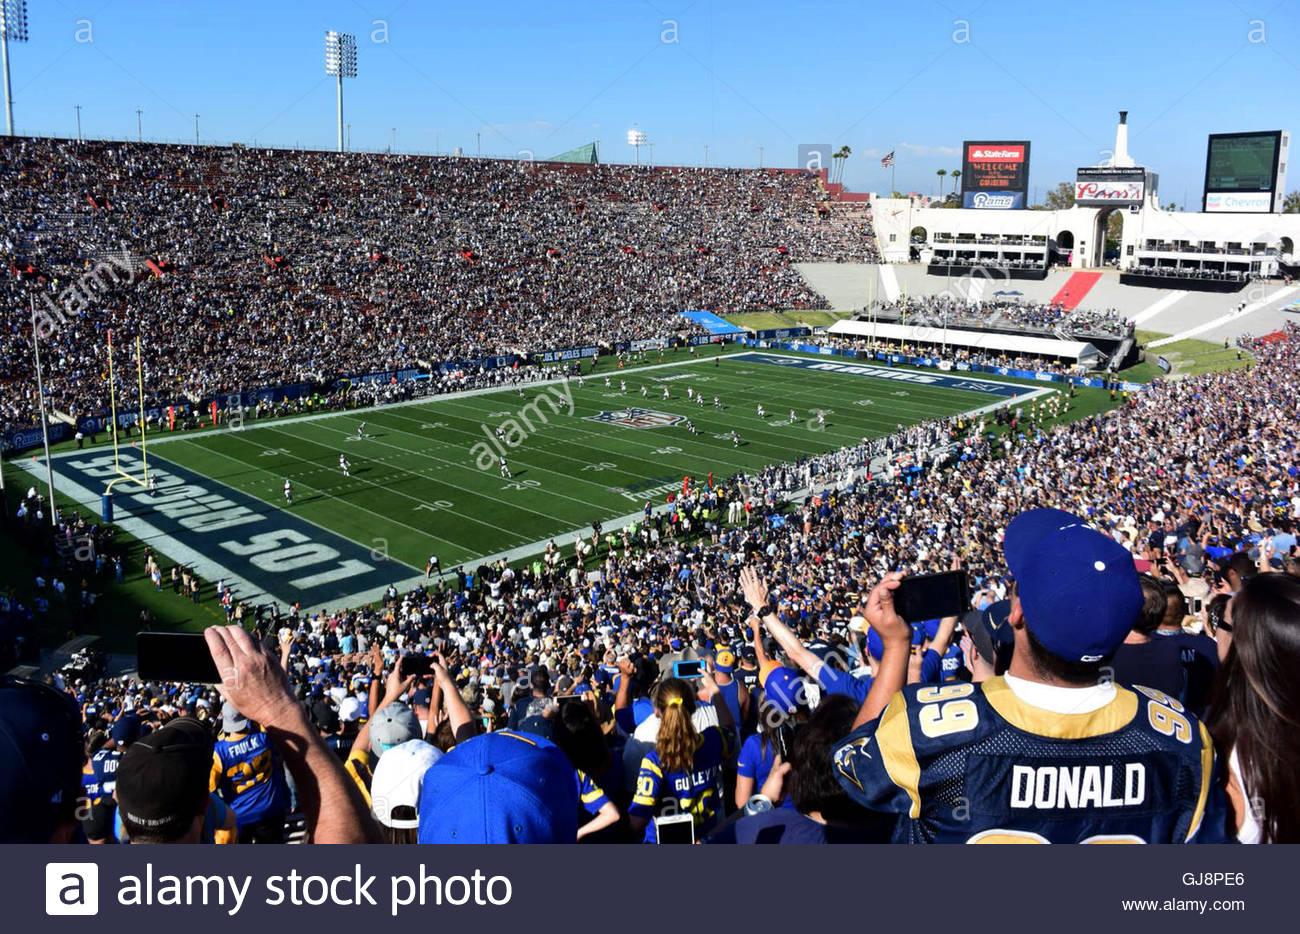 Los Angeles, California, USA. 13th Aug, 2016. Los Angeles Rams kicks-off against the Dallas Cowboys at the Los Angeles Memorial Coliseum on Saturday, August 13, 2016. (Photo by Keith Birmingham/ Pasadena Star-News) © San Gabriel Valley Tribune/ZUMA Wire/Alamy Live News Stock Photo